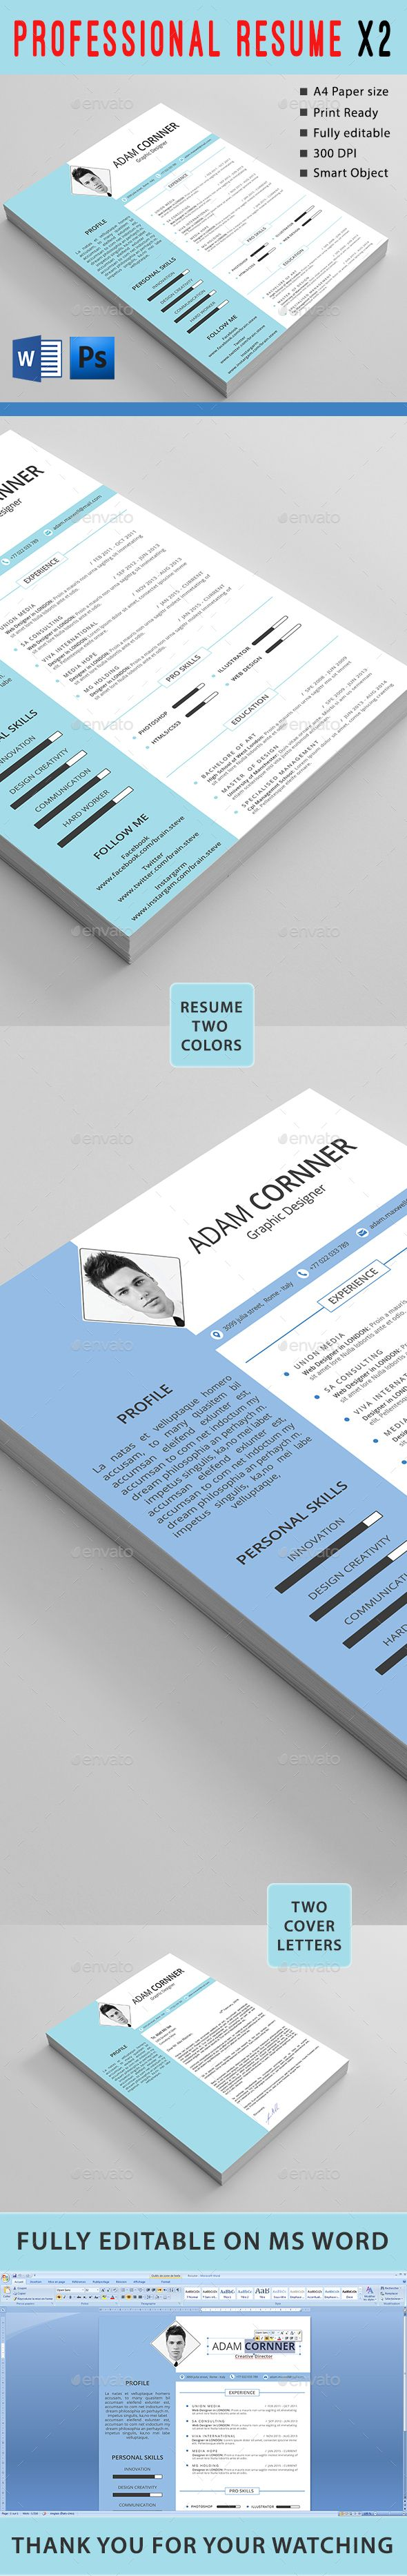 25 best Resume/CV Templates images on Pinterest | Cover letter ...